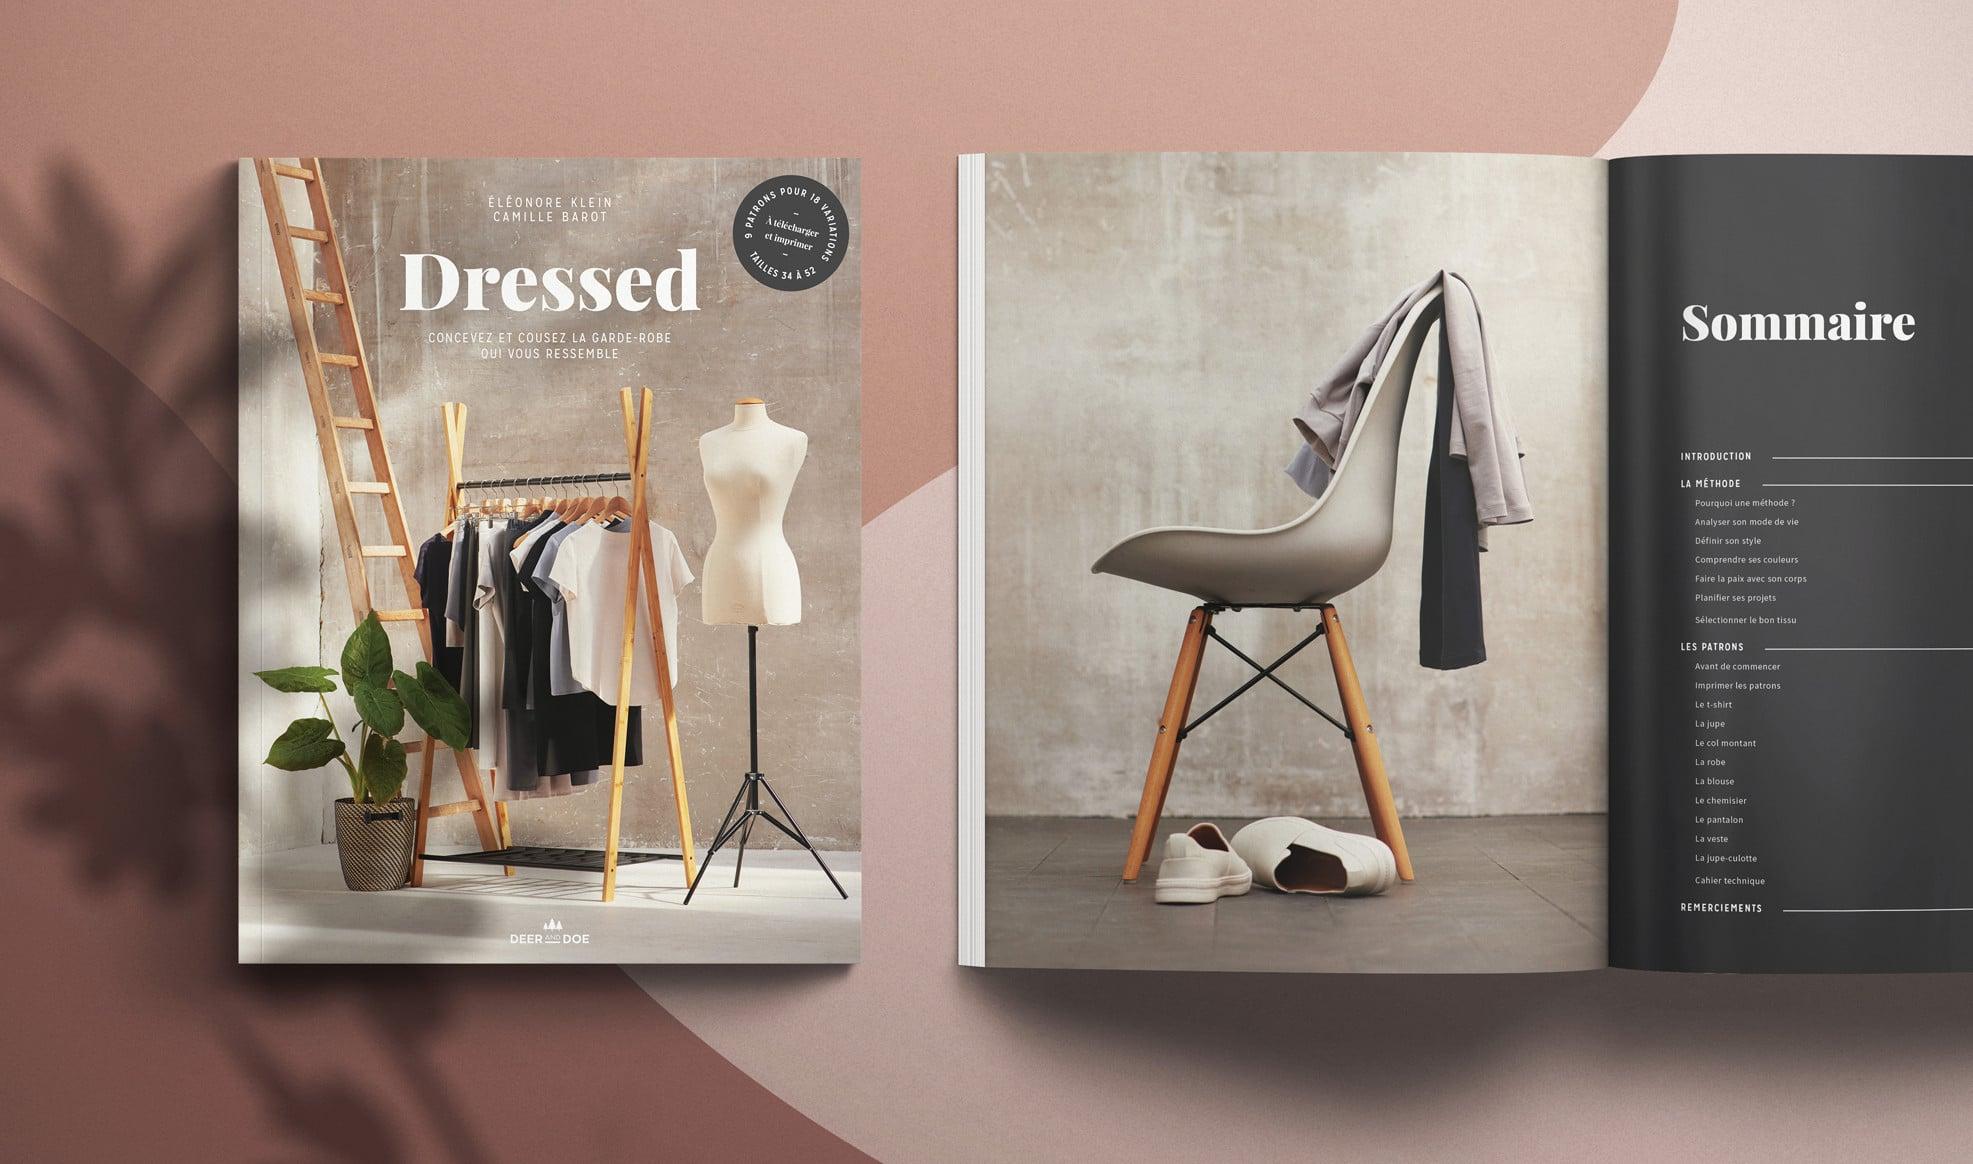 Livre Dressed de Deer & Doe - revue de Louise Magazine